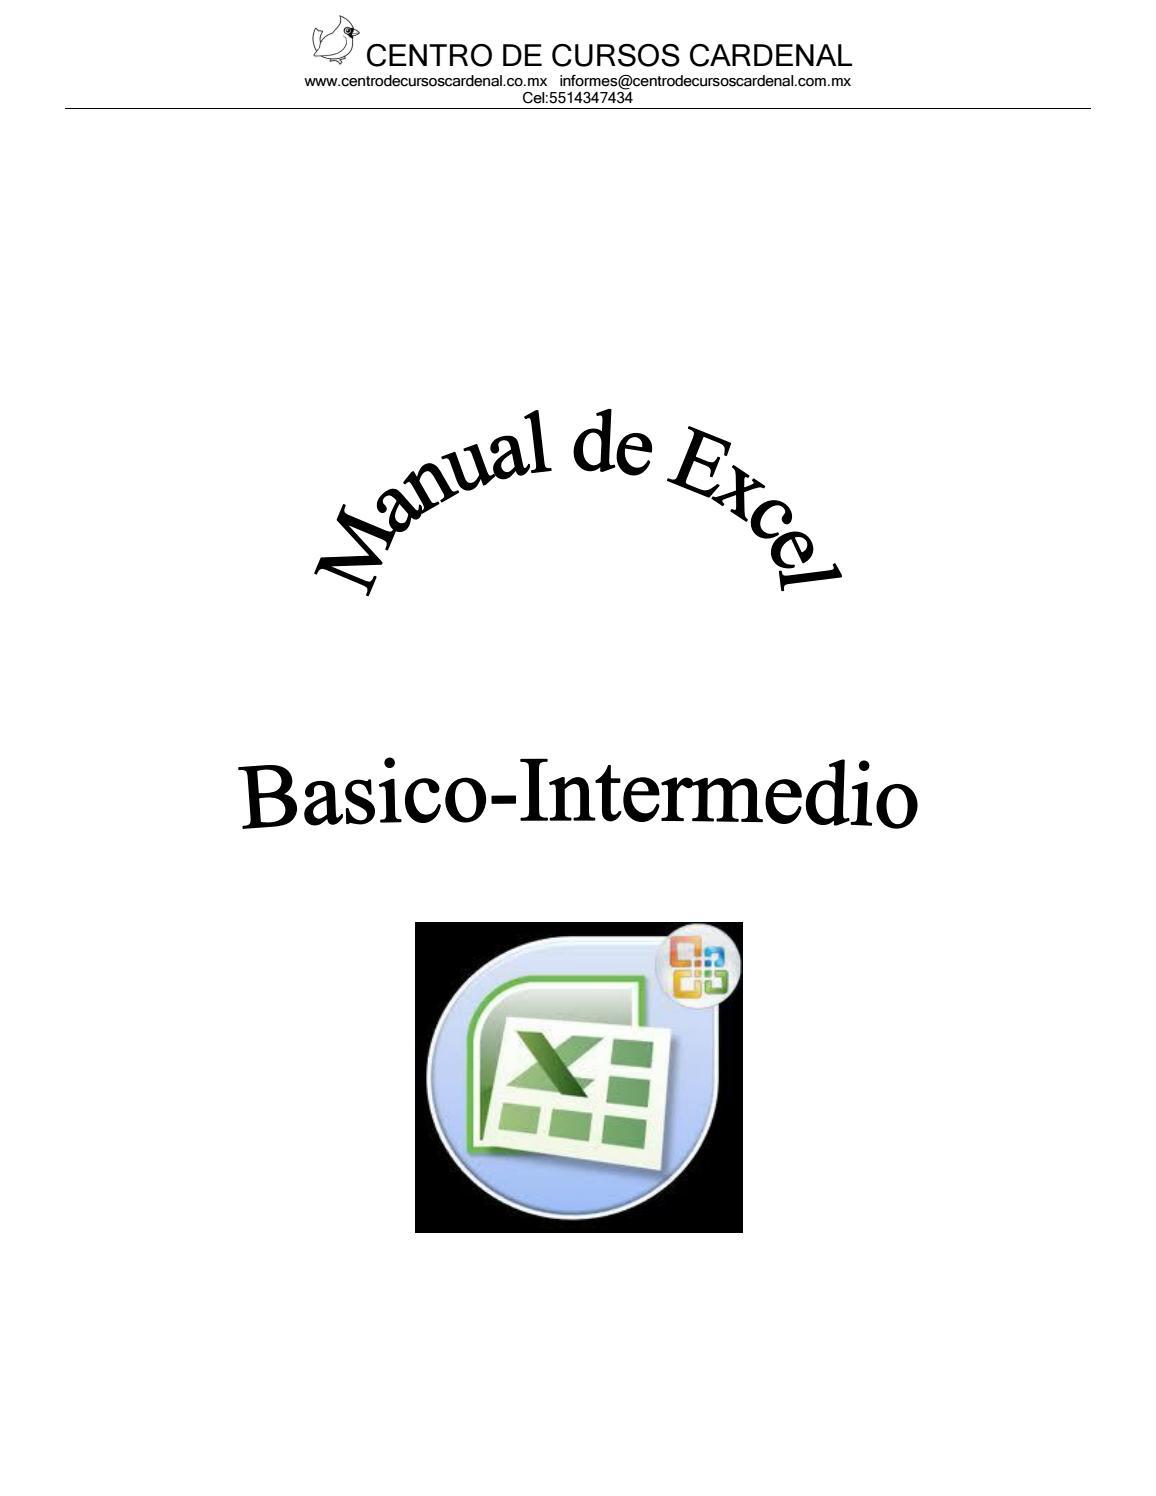 Manual excel basico inermedio actual 07 by Cursos Cardenal - issuu